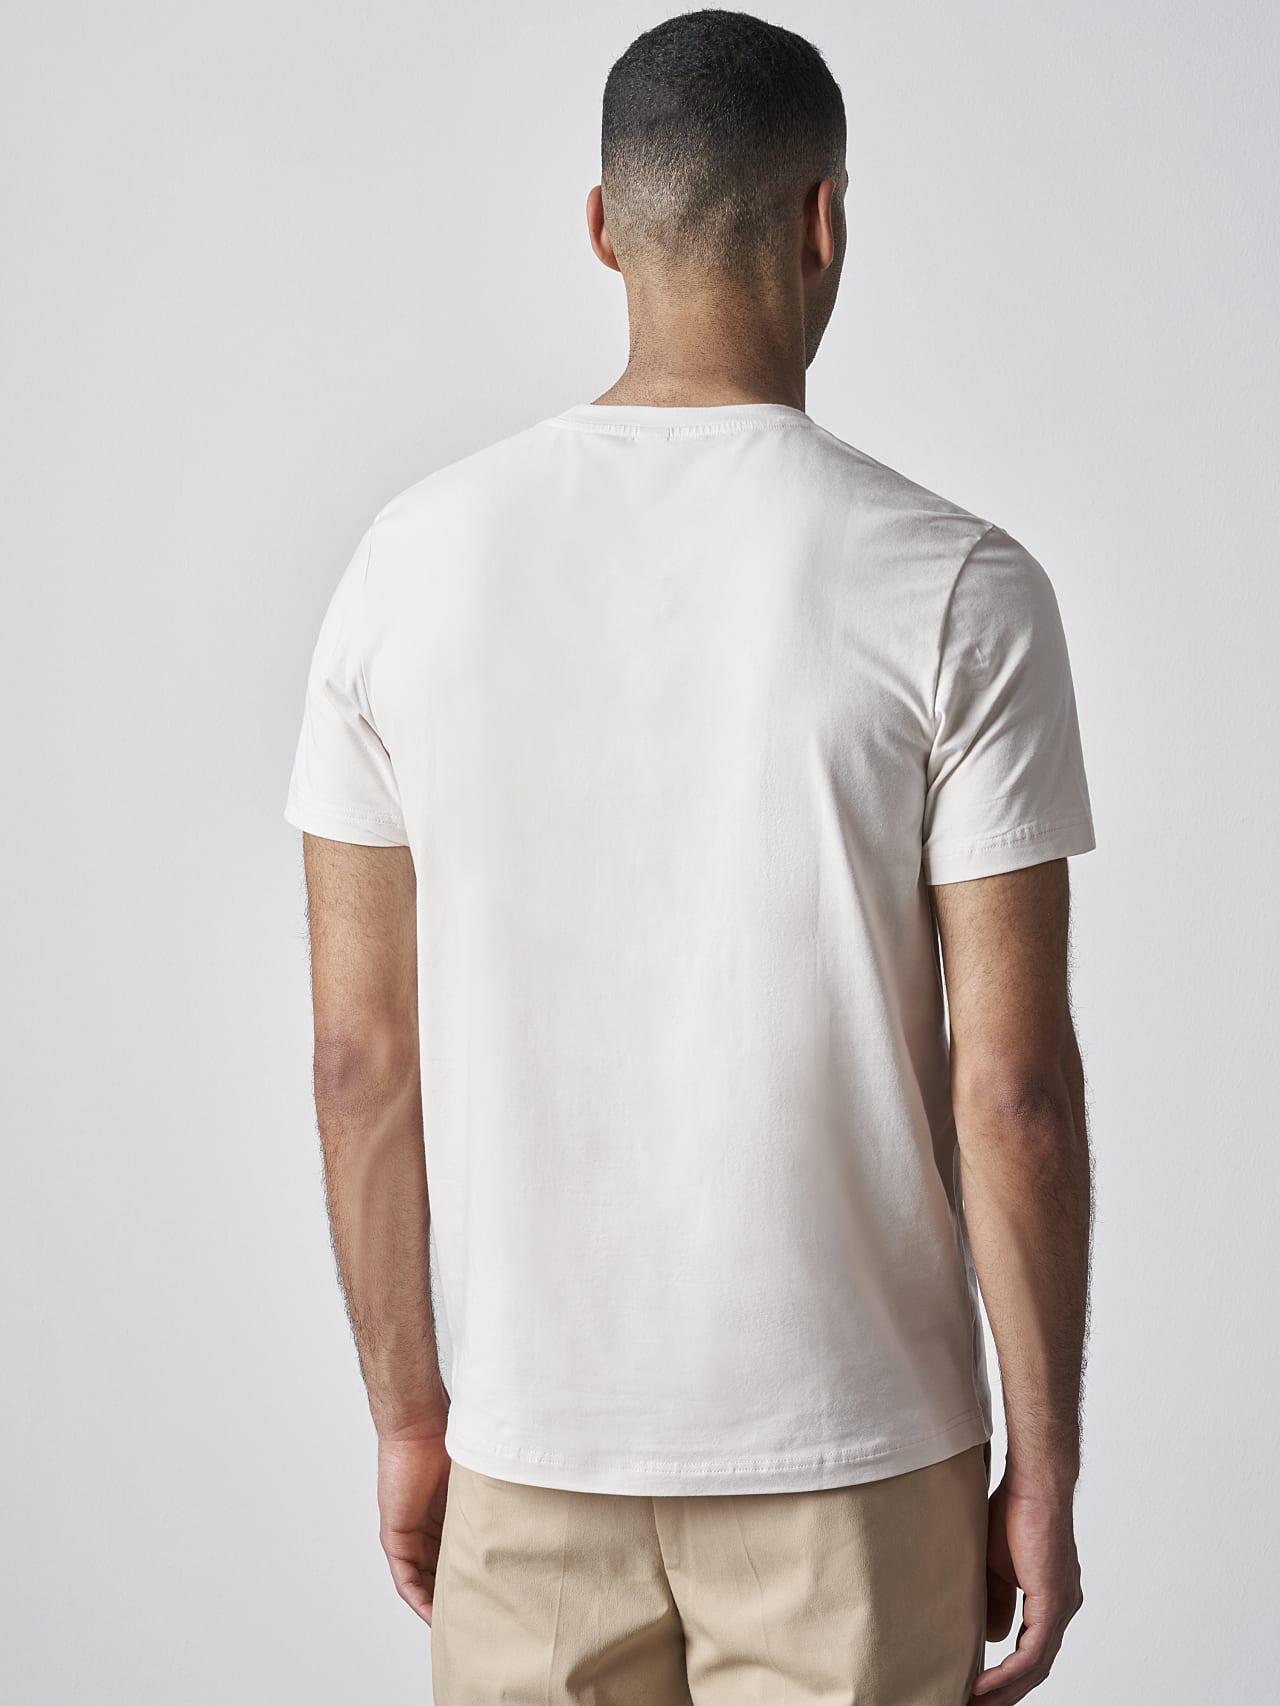 JERO V2.Y4.02 Signature Logo T-Shirt Sand Front Main Alpha Tauri